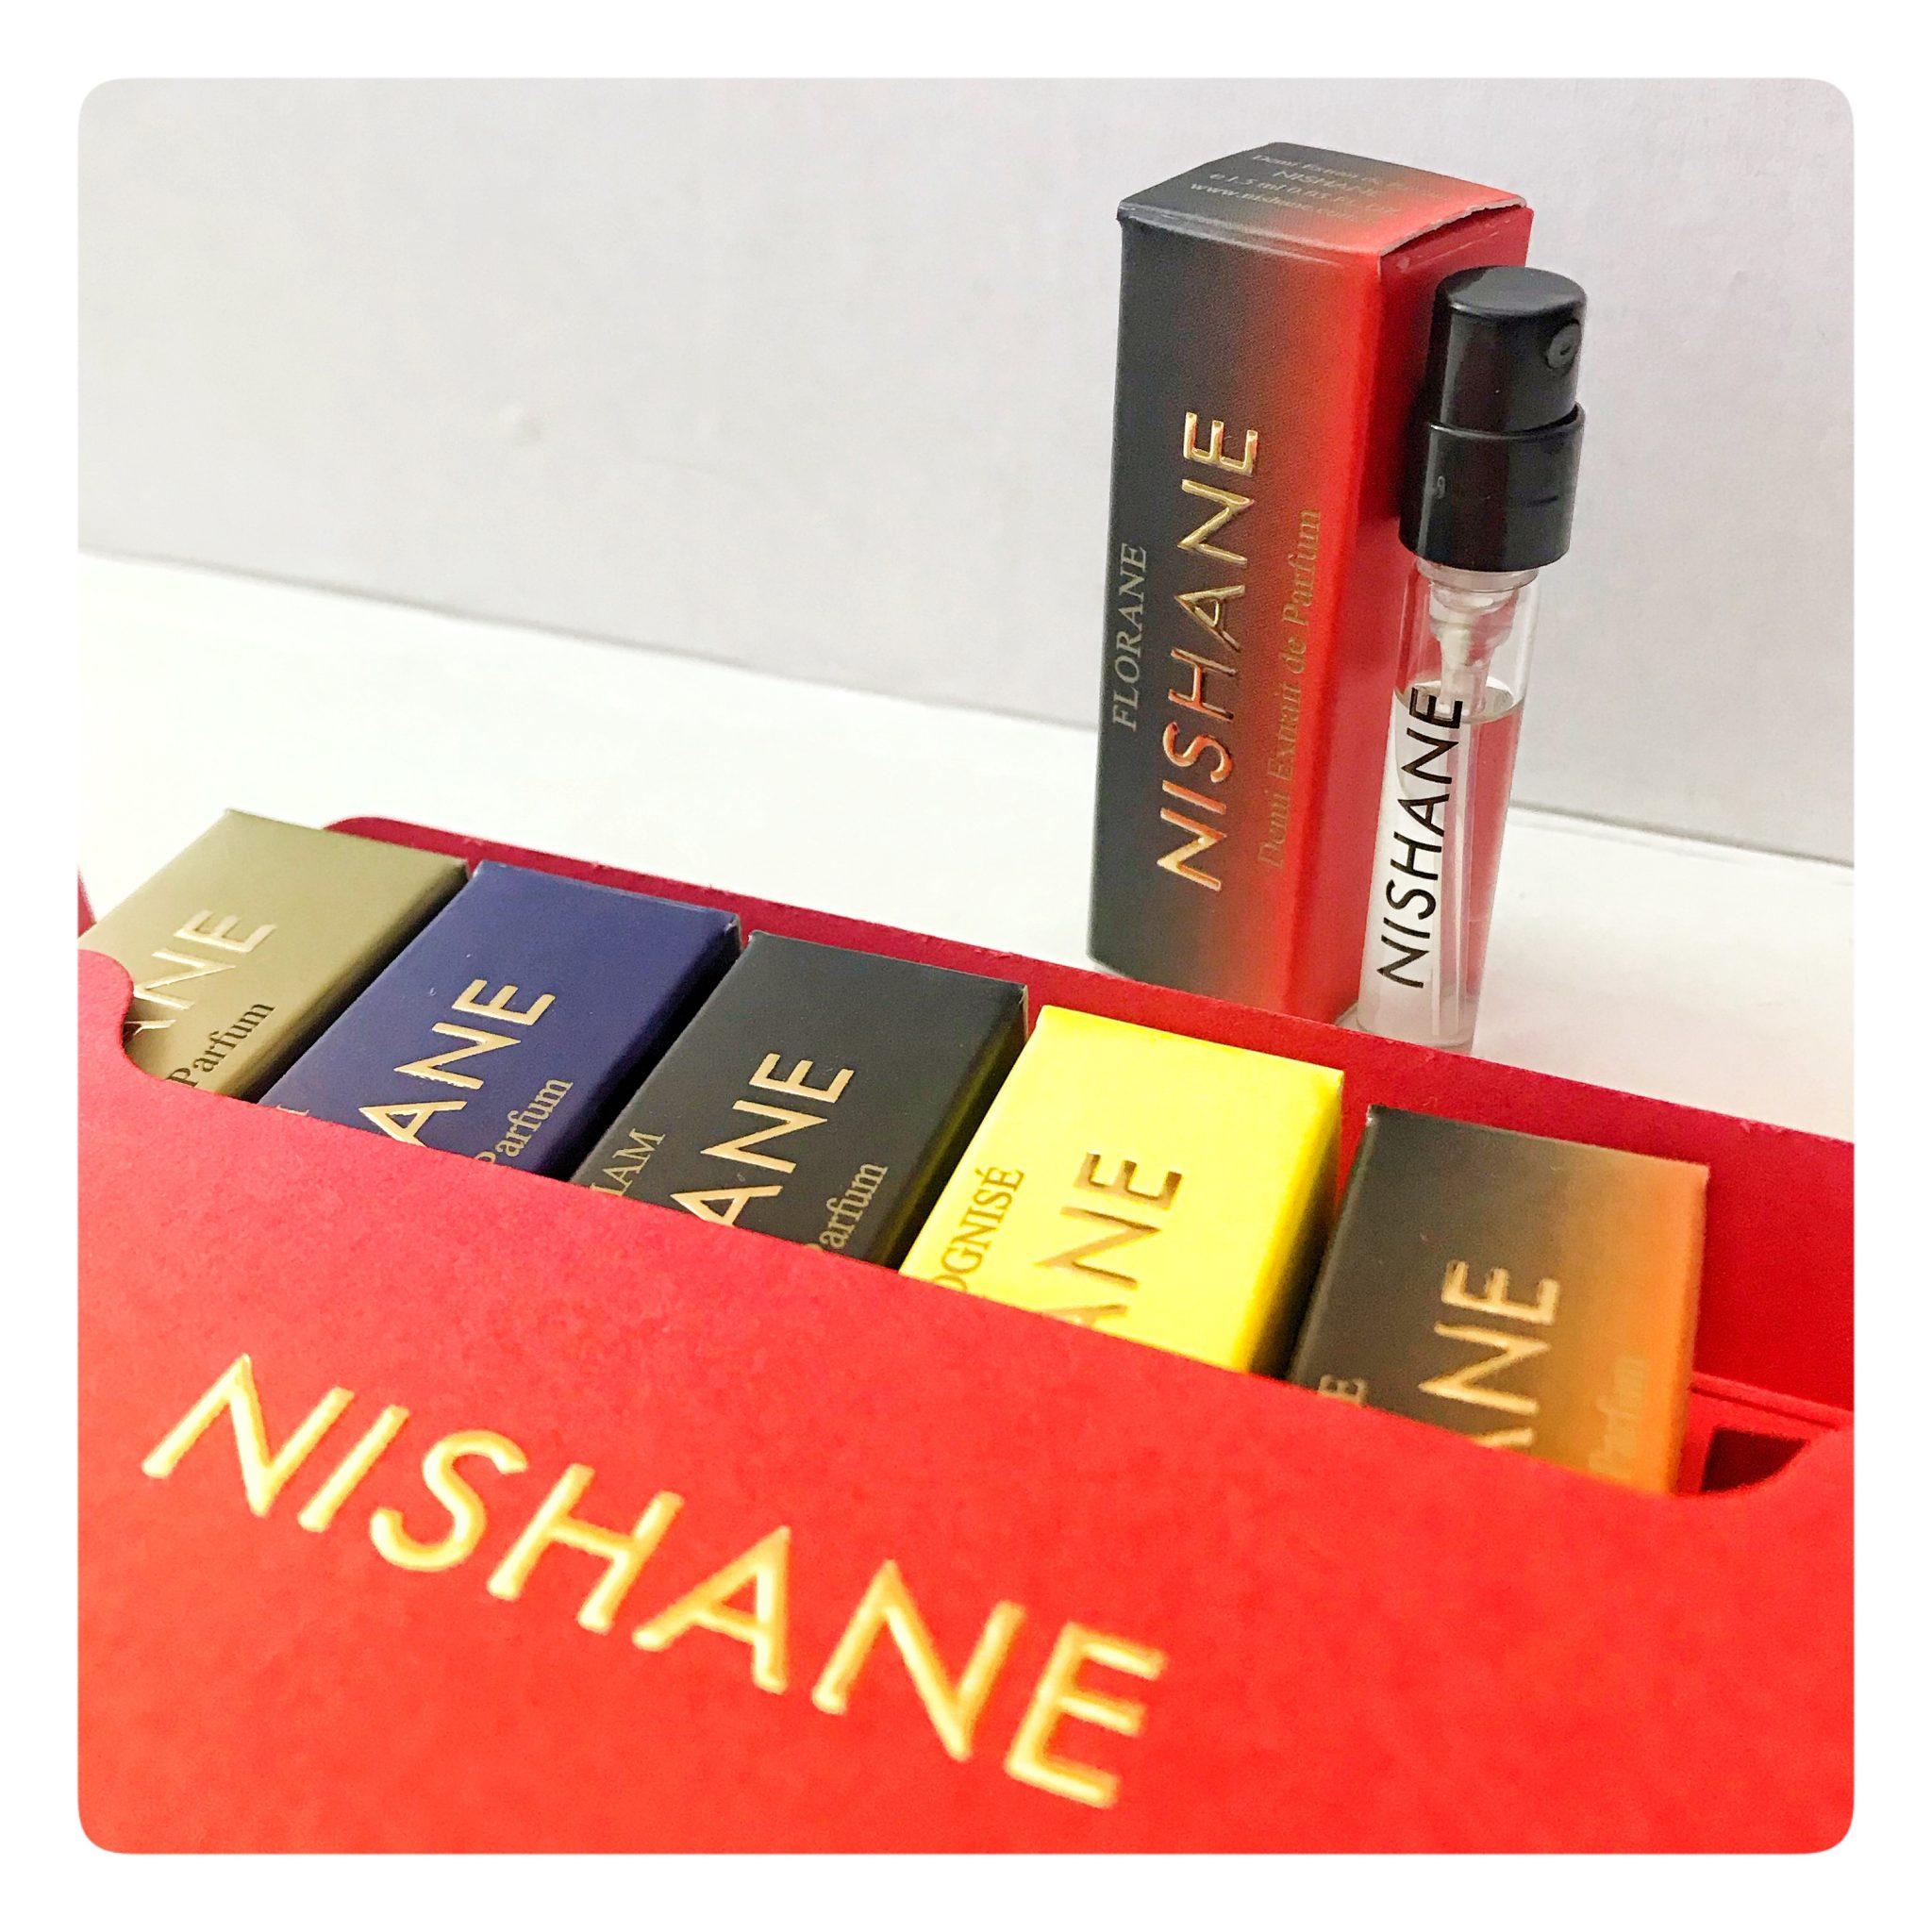 Nishane New Collection